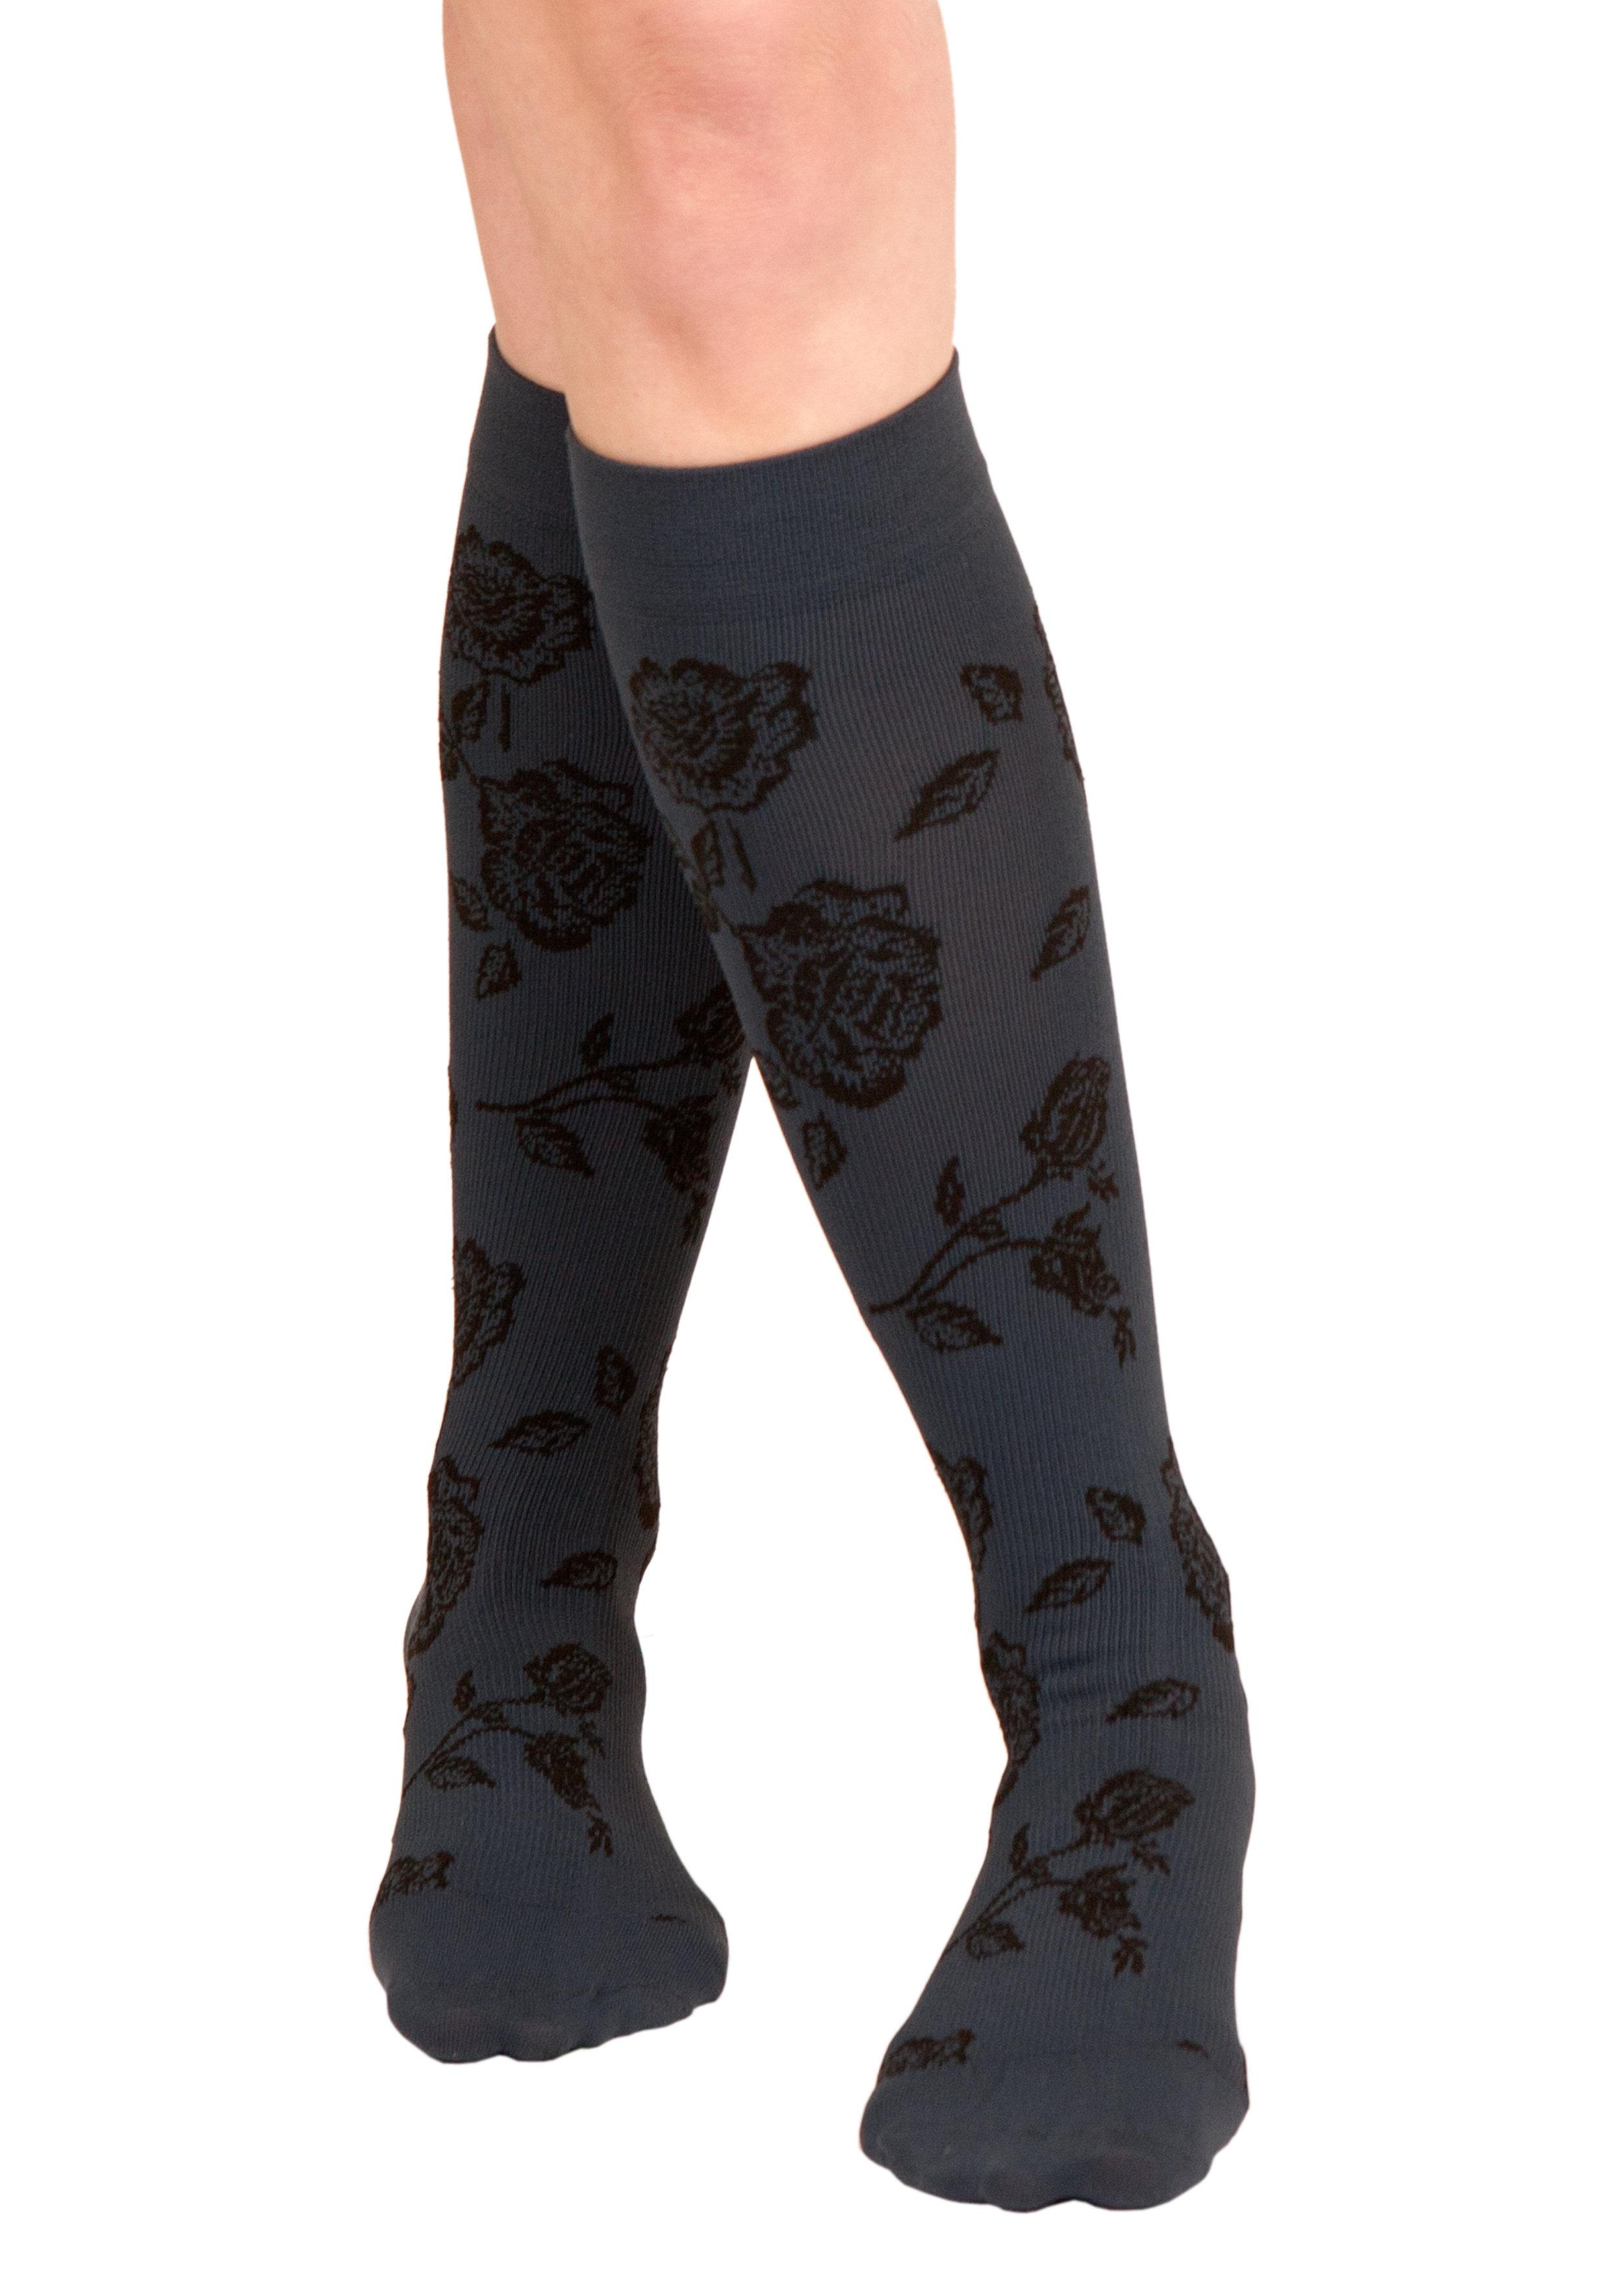 824d525ac Silkies Compression Floral Trouser Socks (15-20 mmHg)